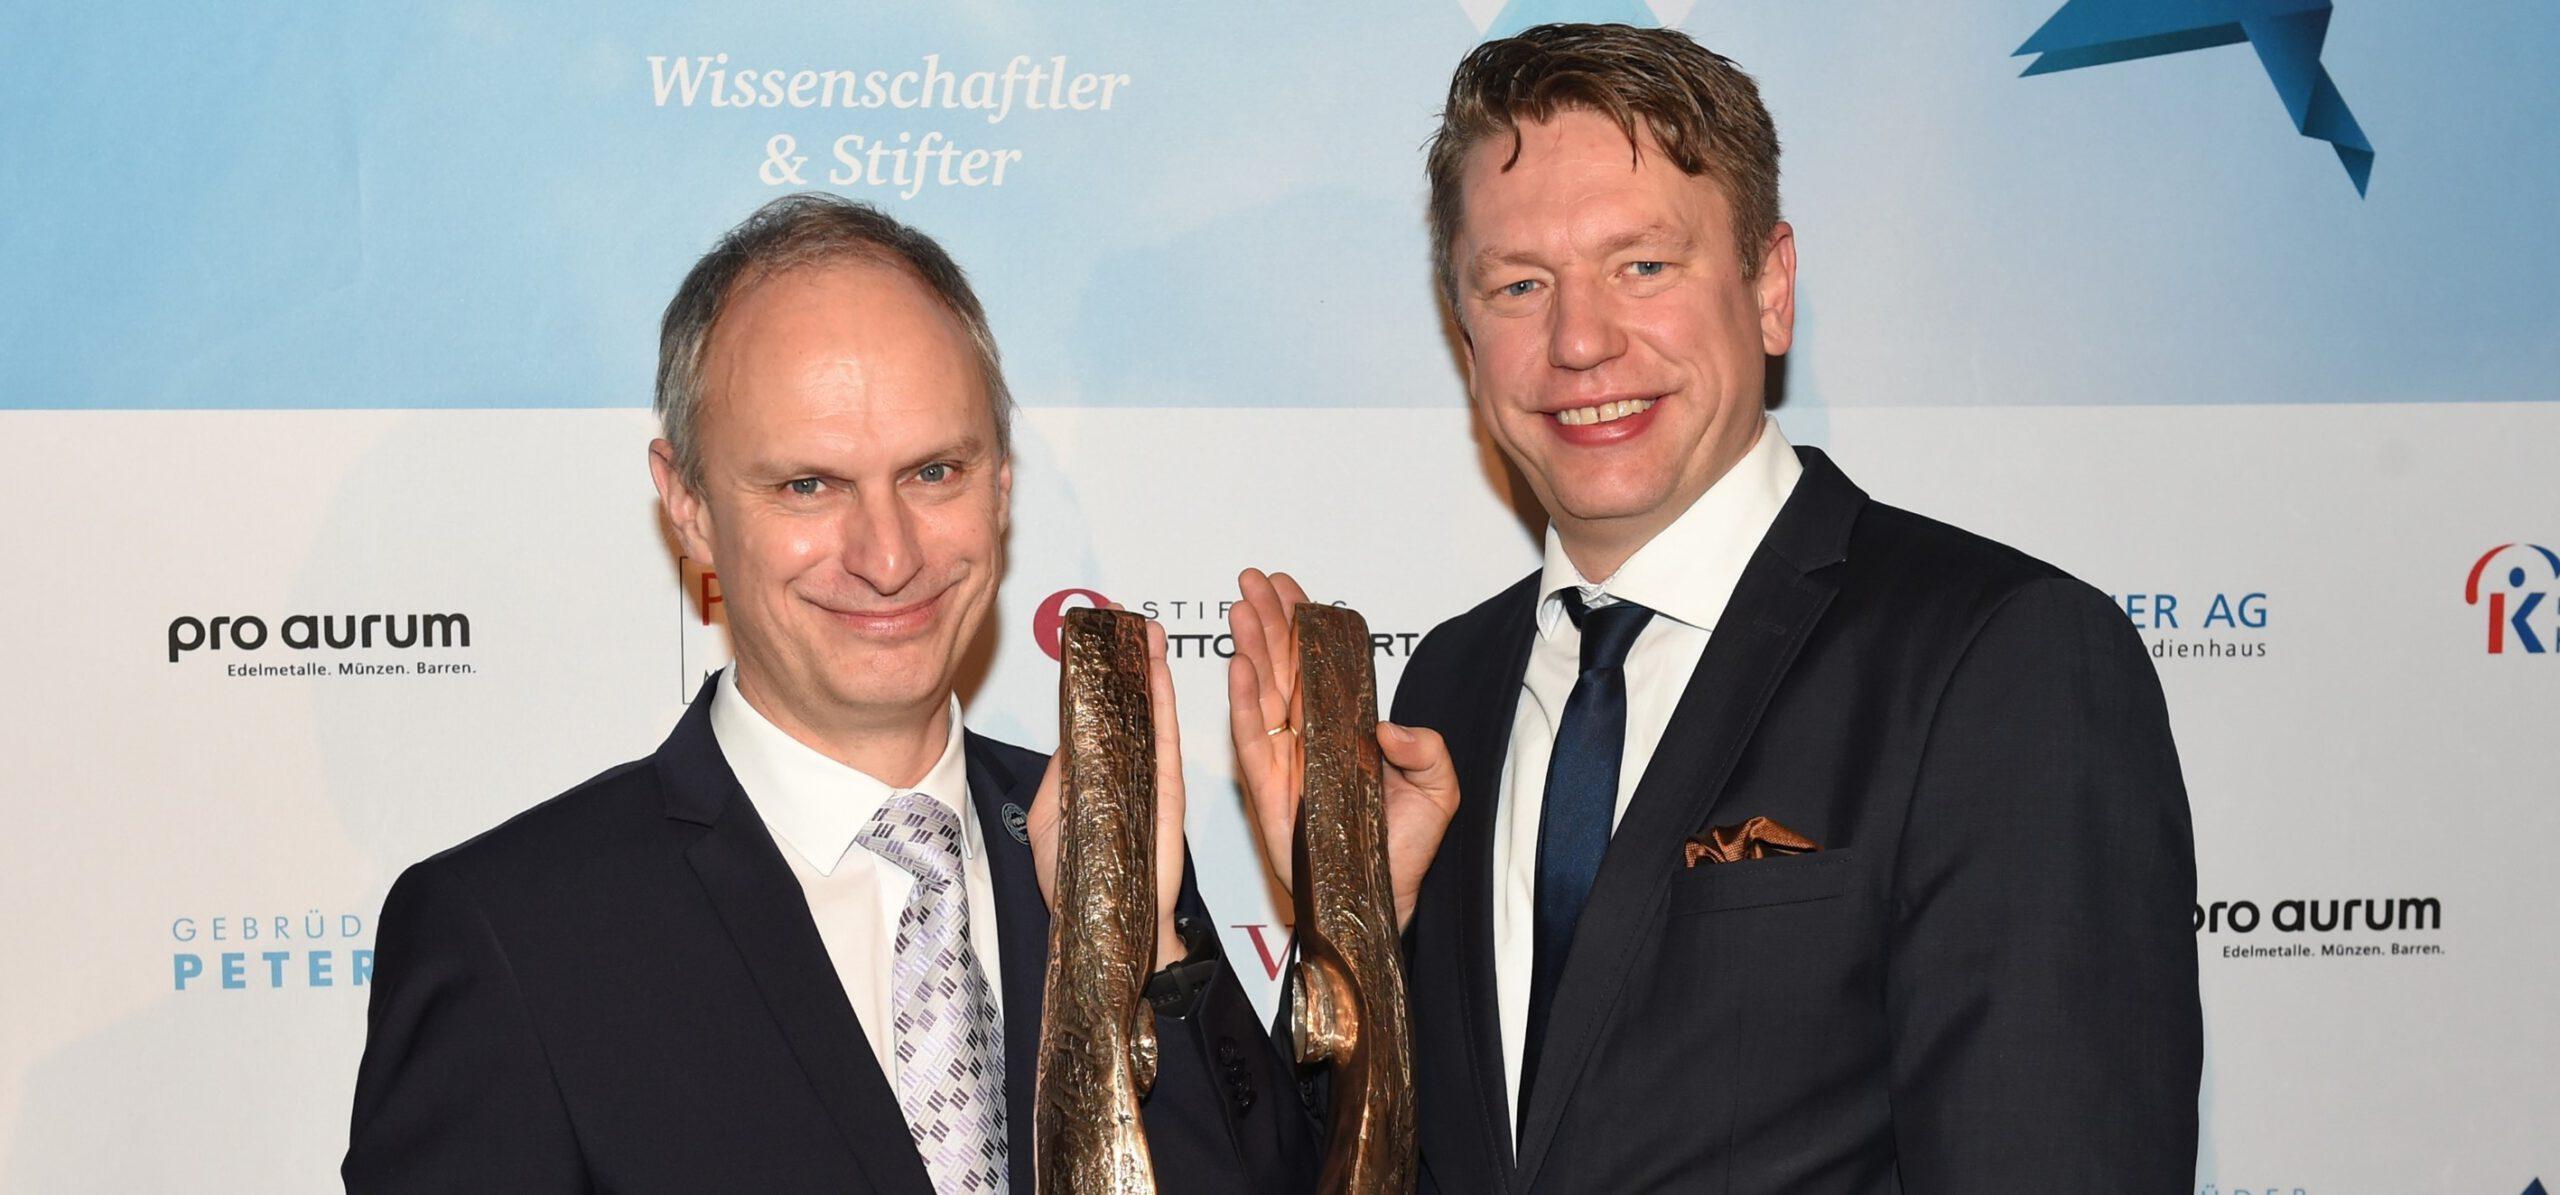 Care-for-Rare Science Awards 2018 an Prof. Dr. Tobias Hirsch und Prof. Dr. Dierk Niessing